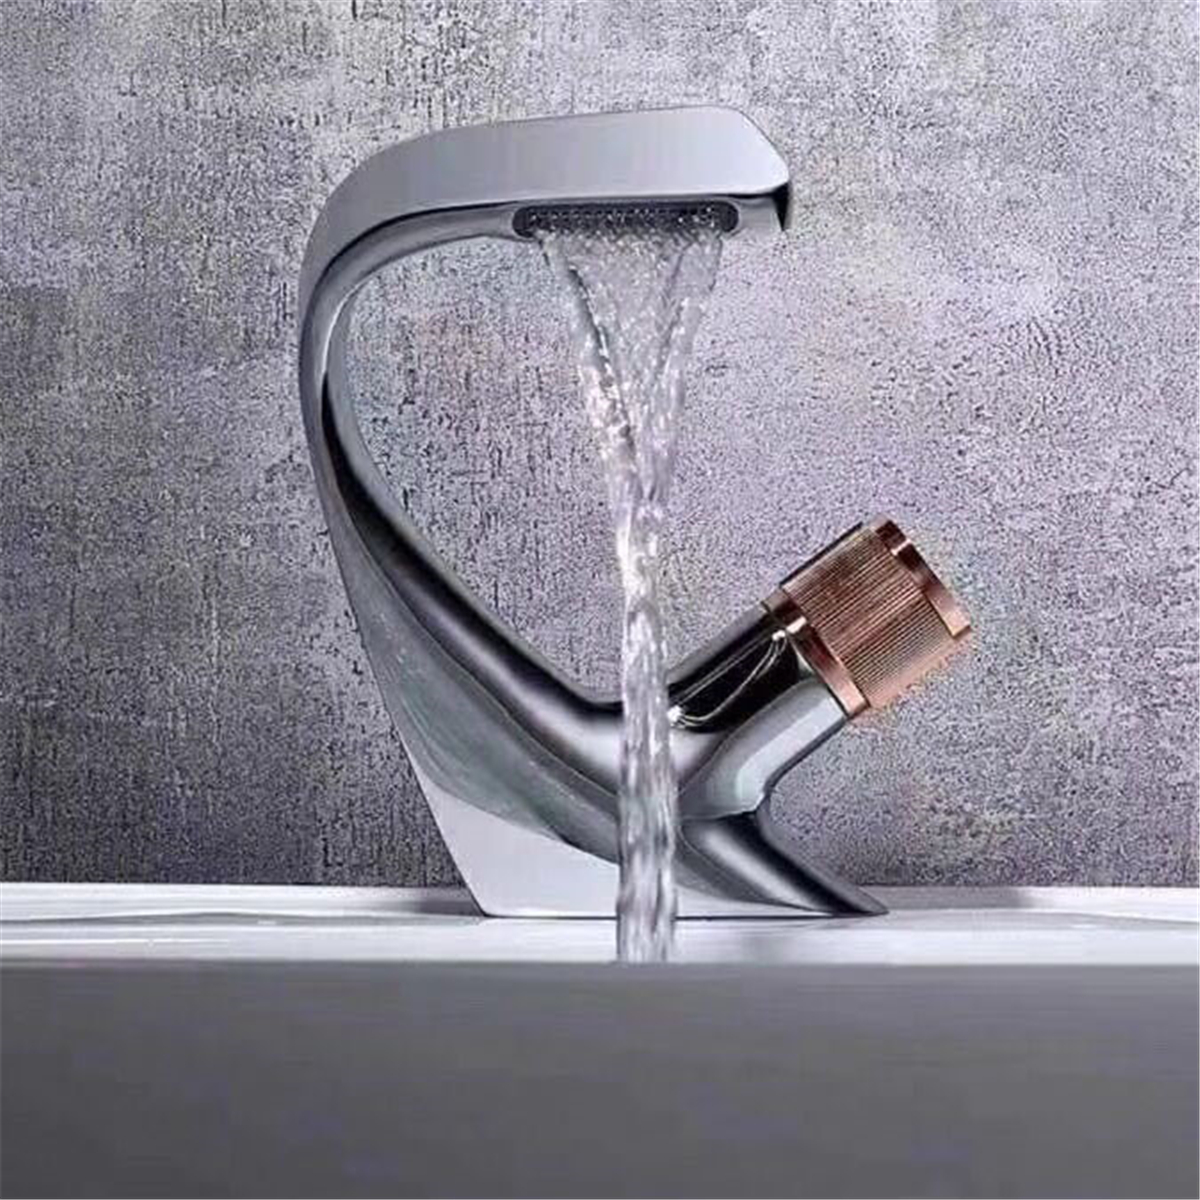 Hf0970565420e44f494fa710fe1217222i Black Faucet Bathroom Sink Faucets Hot Cold Water Mixer Crane Deck Mounted Single Hole Bath Tap Chrome Finished